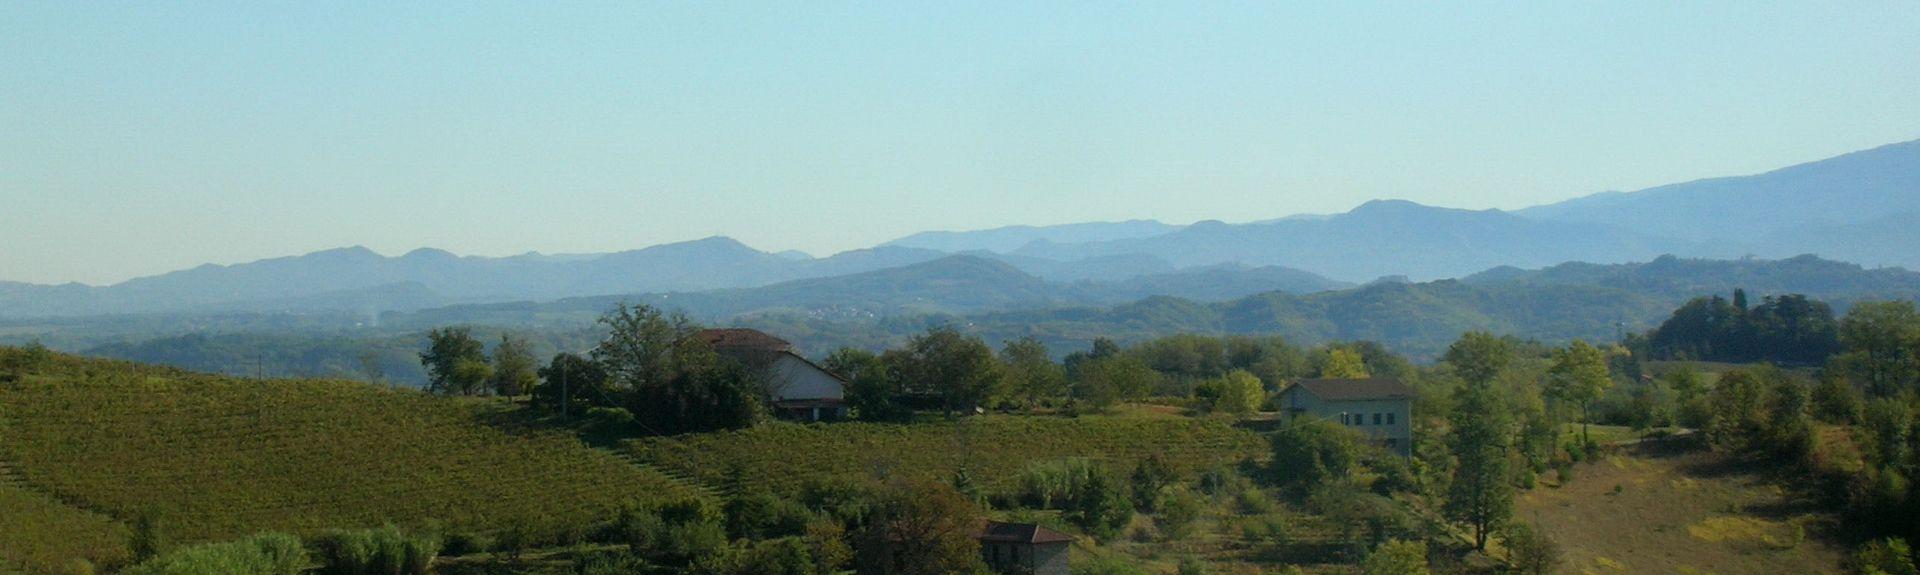 Pasturana, Piemonte, Itália